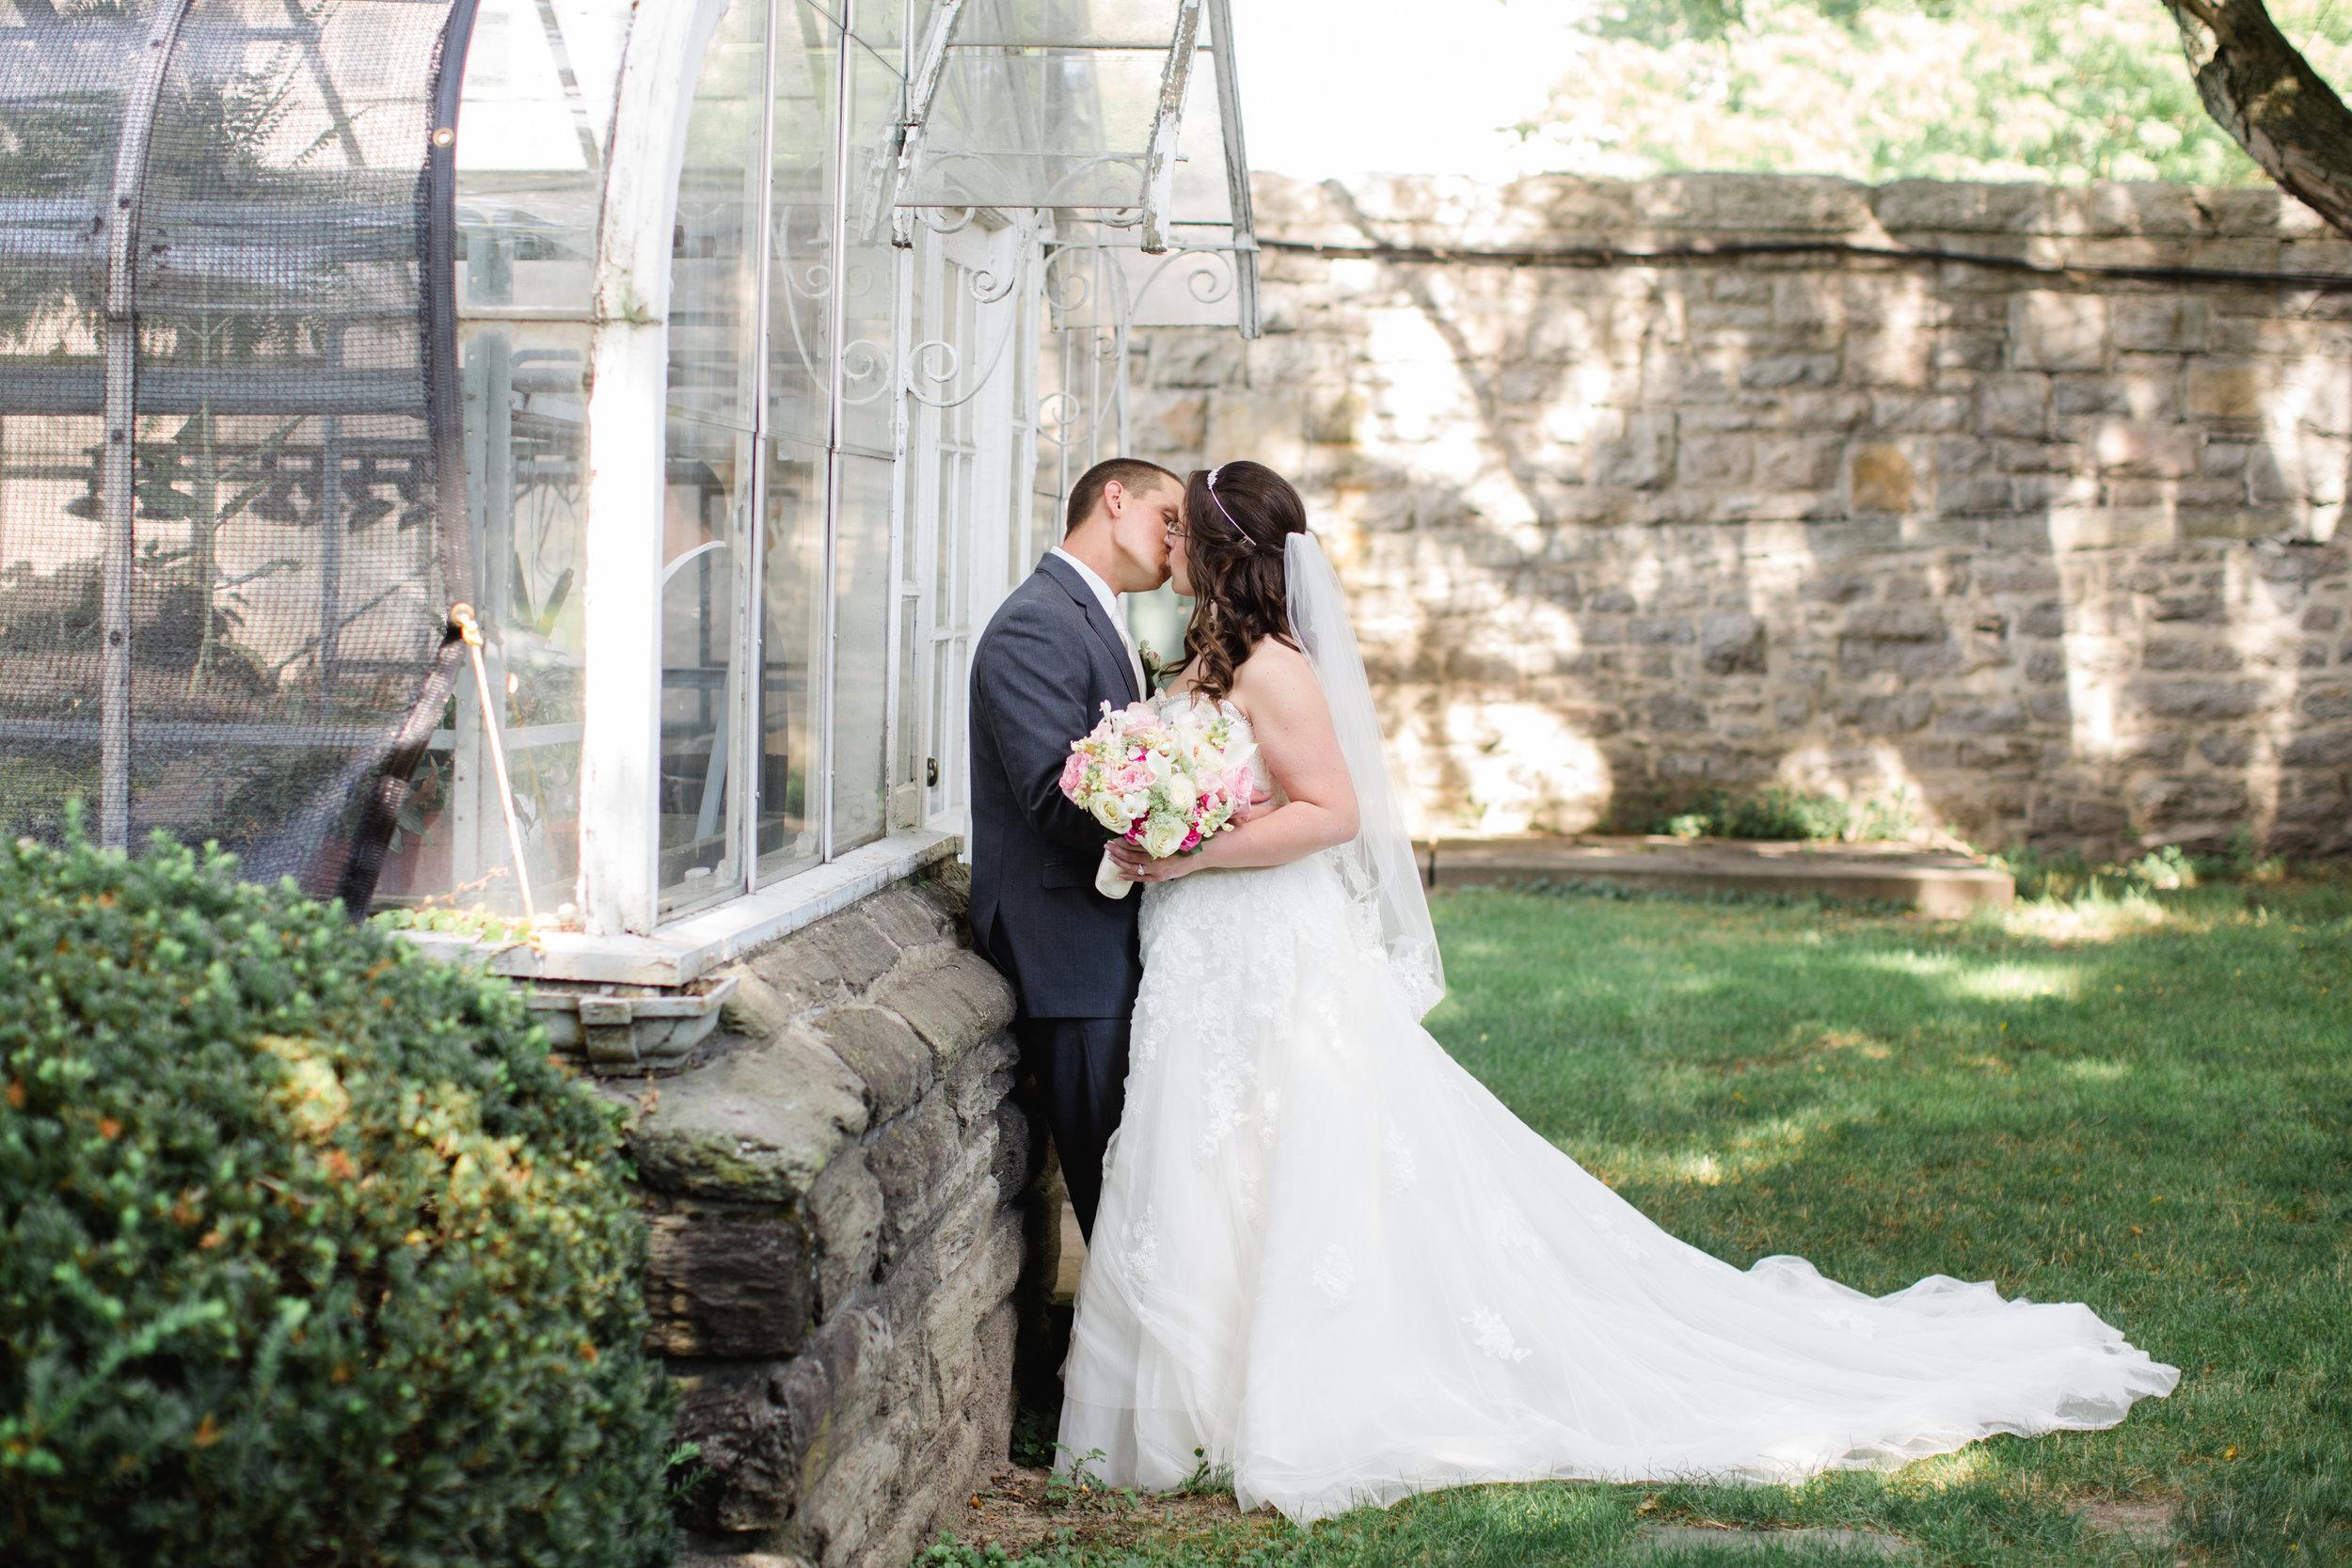 Scranton PA Lawnhaven Stroudsmoor Wedding Photography_JDP-8369.jpg